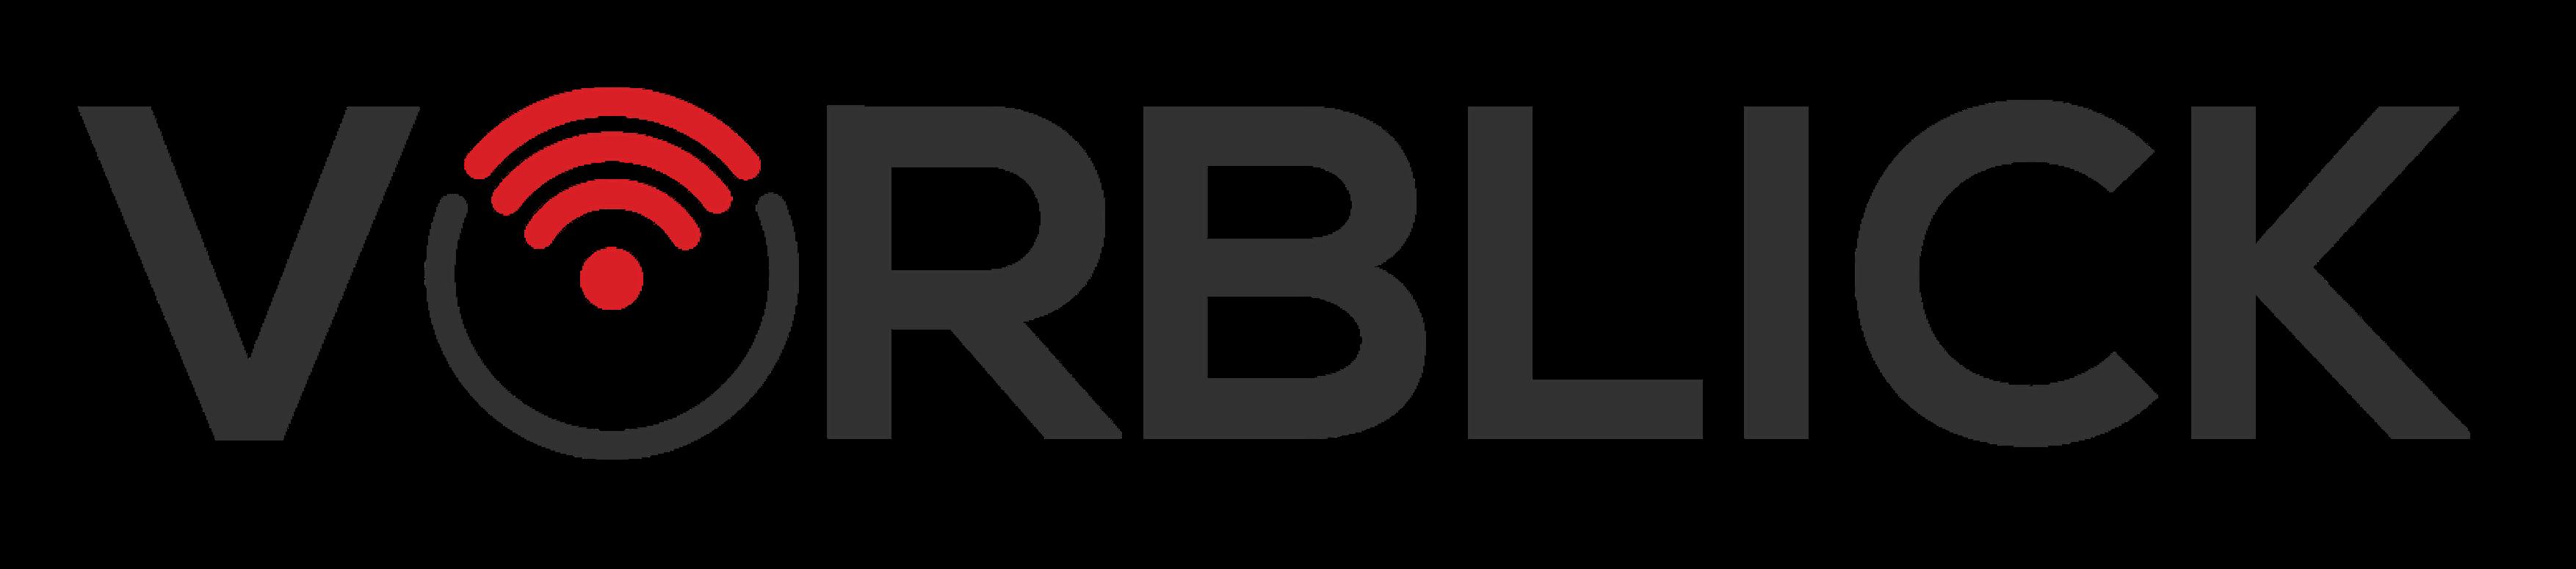 vorblick logo